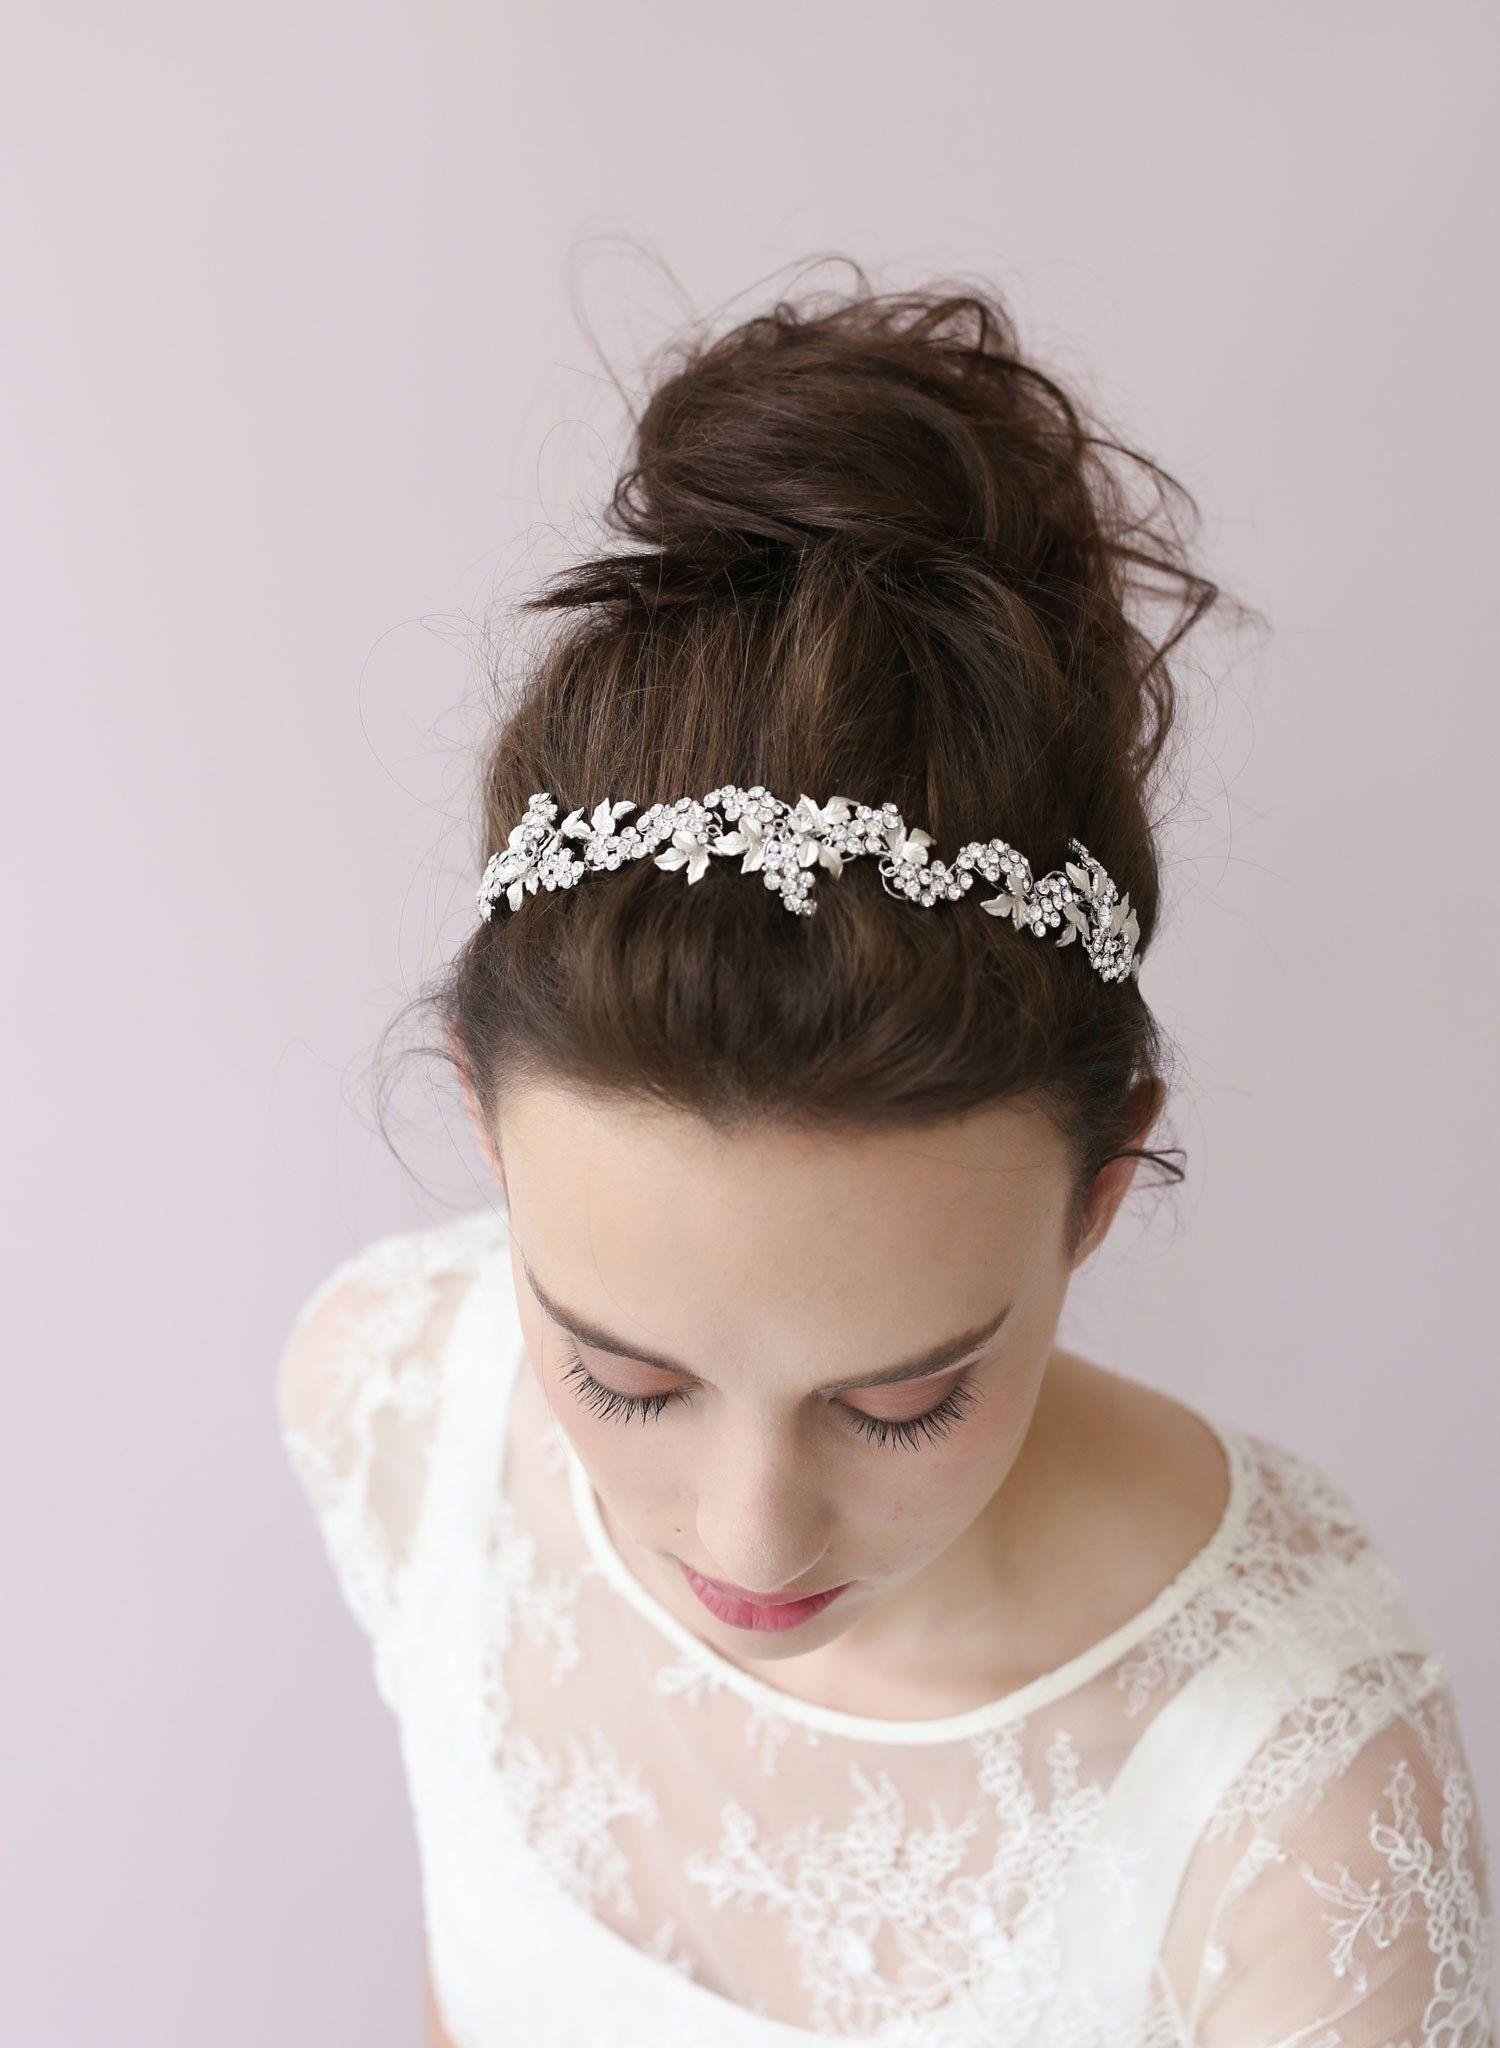 Crystal grape cluster tiara - Style # 403